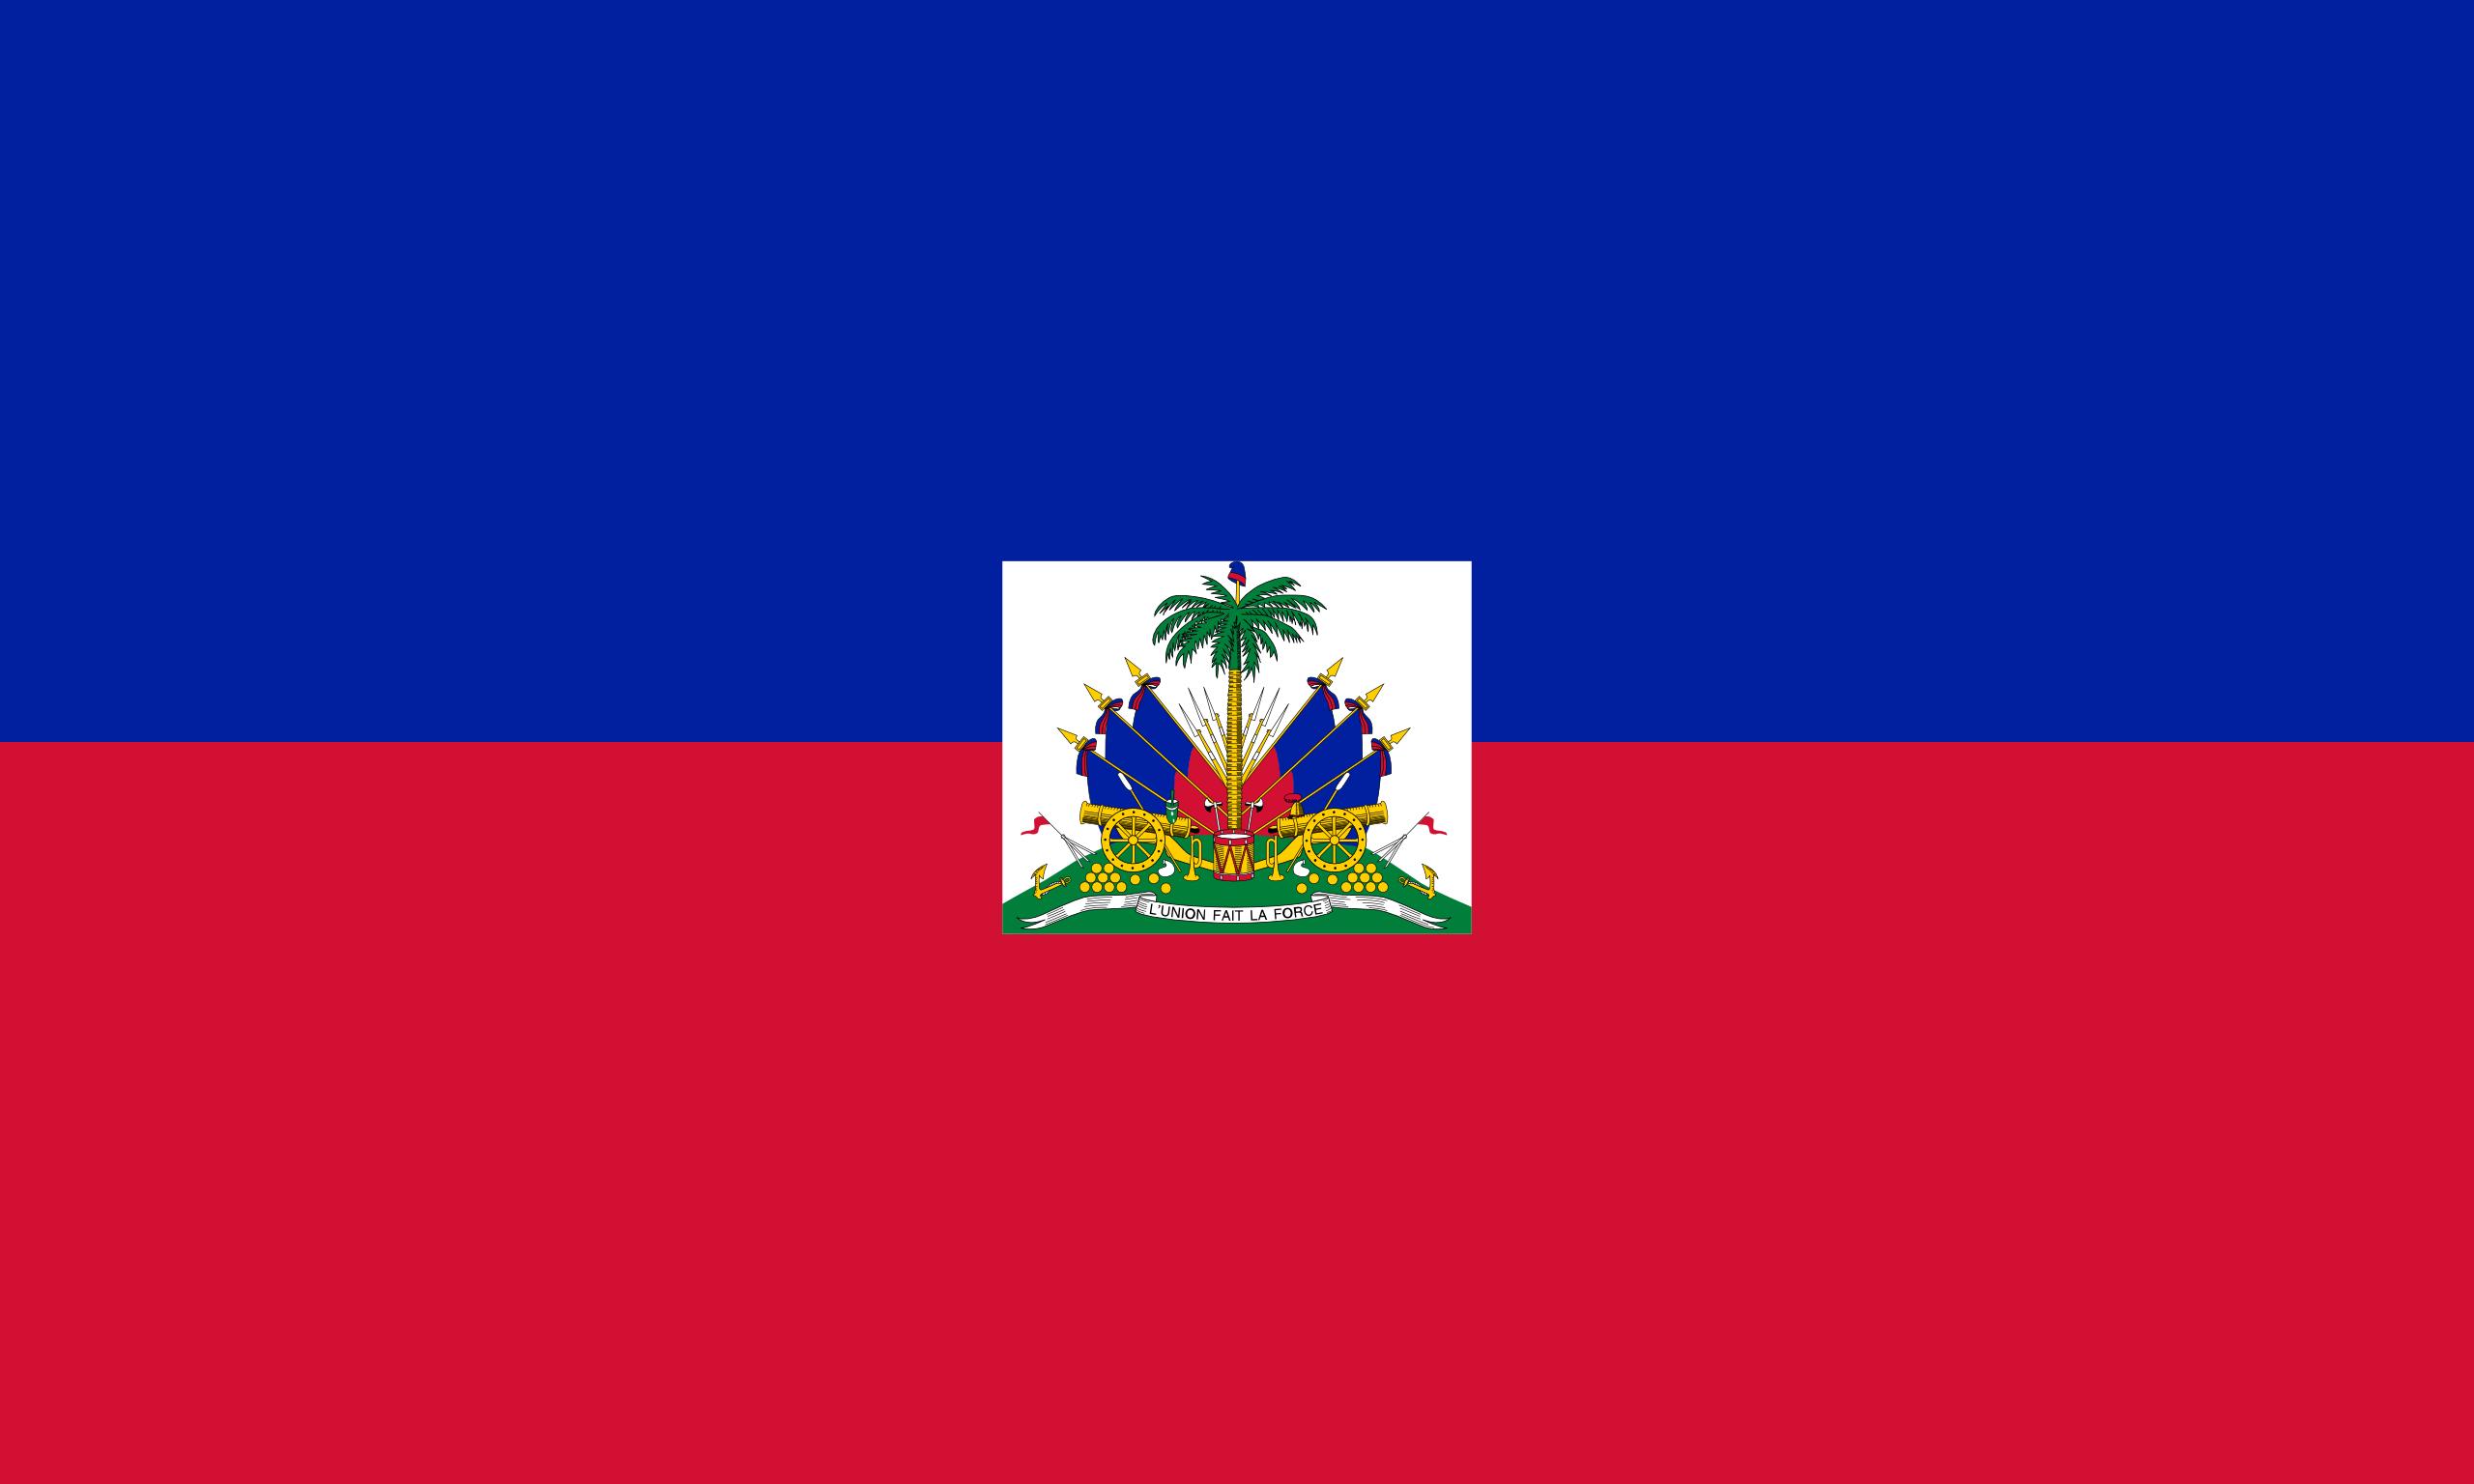 haití, país, emblema, insignia, シンボル - HD の壁紙 - 教授-falken.com